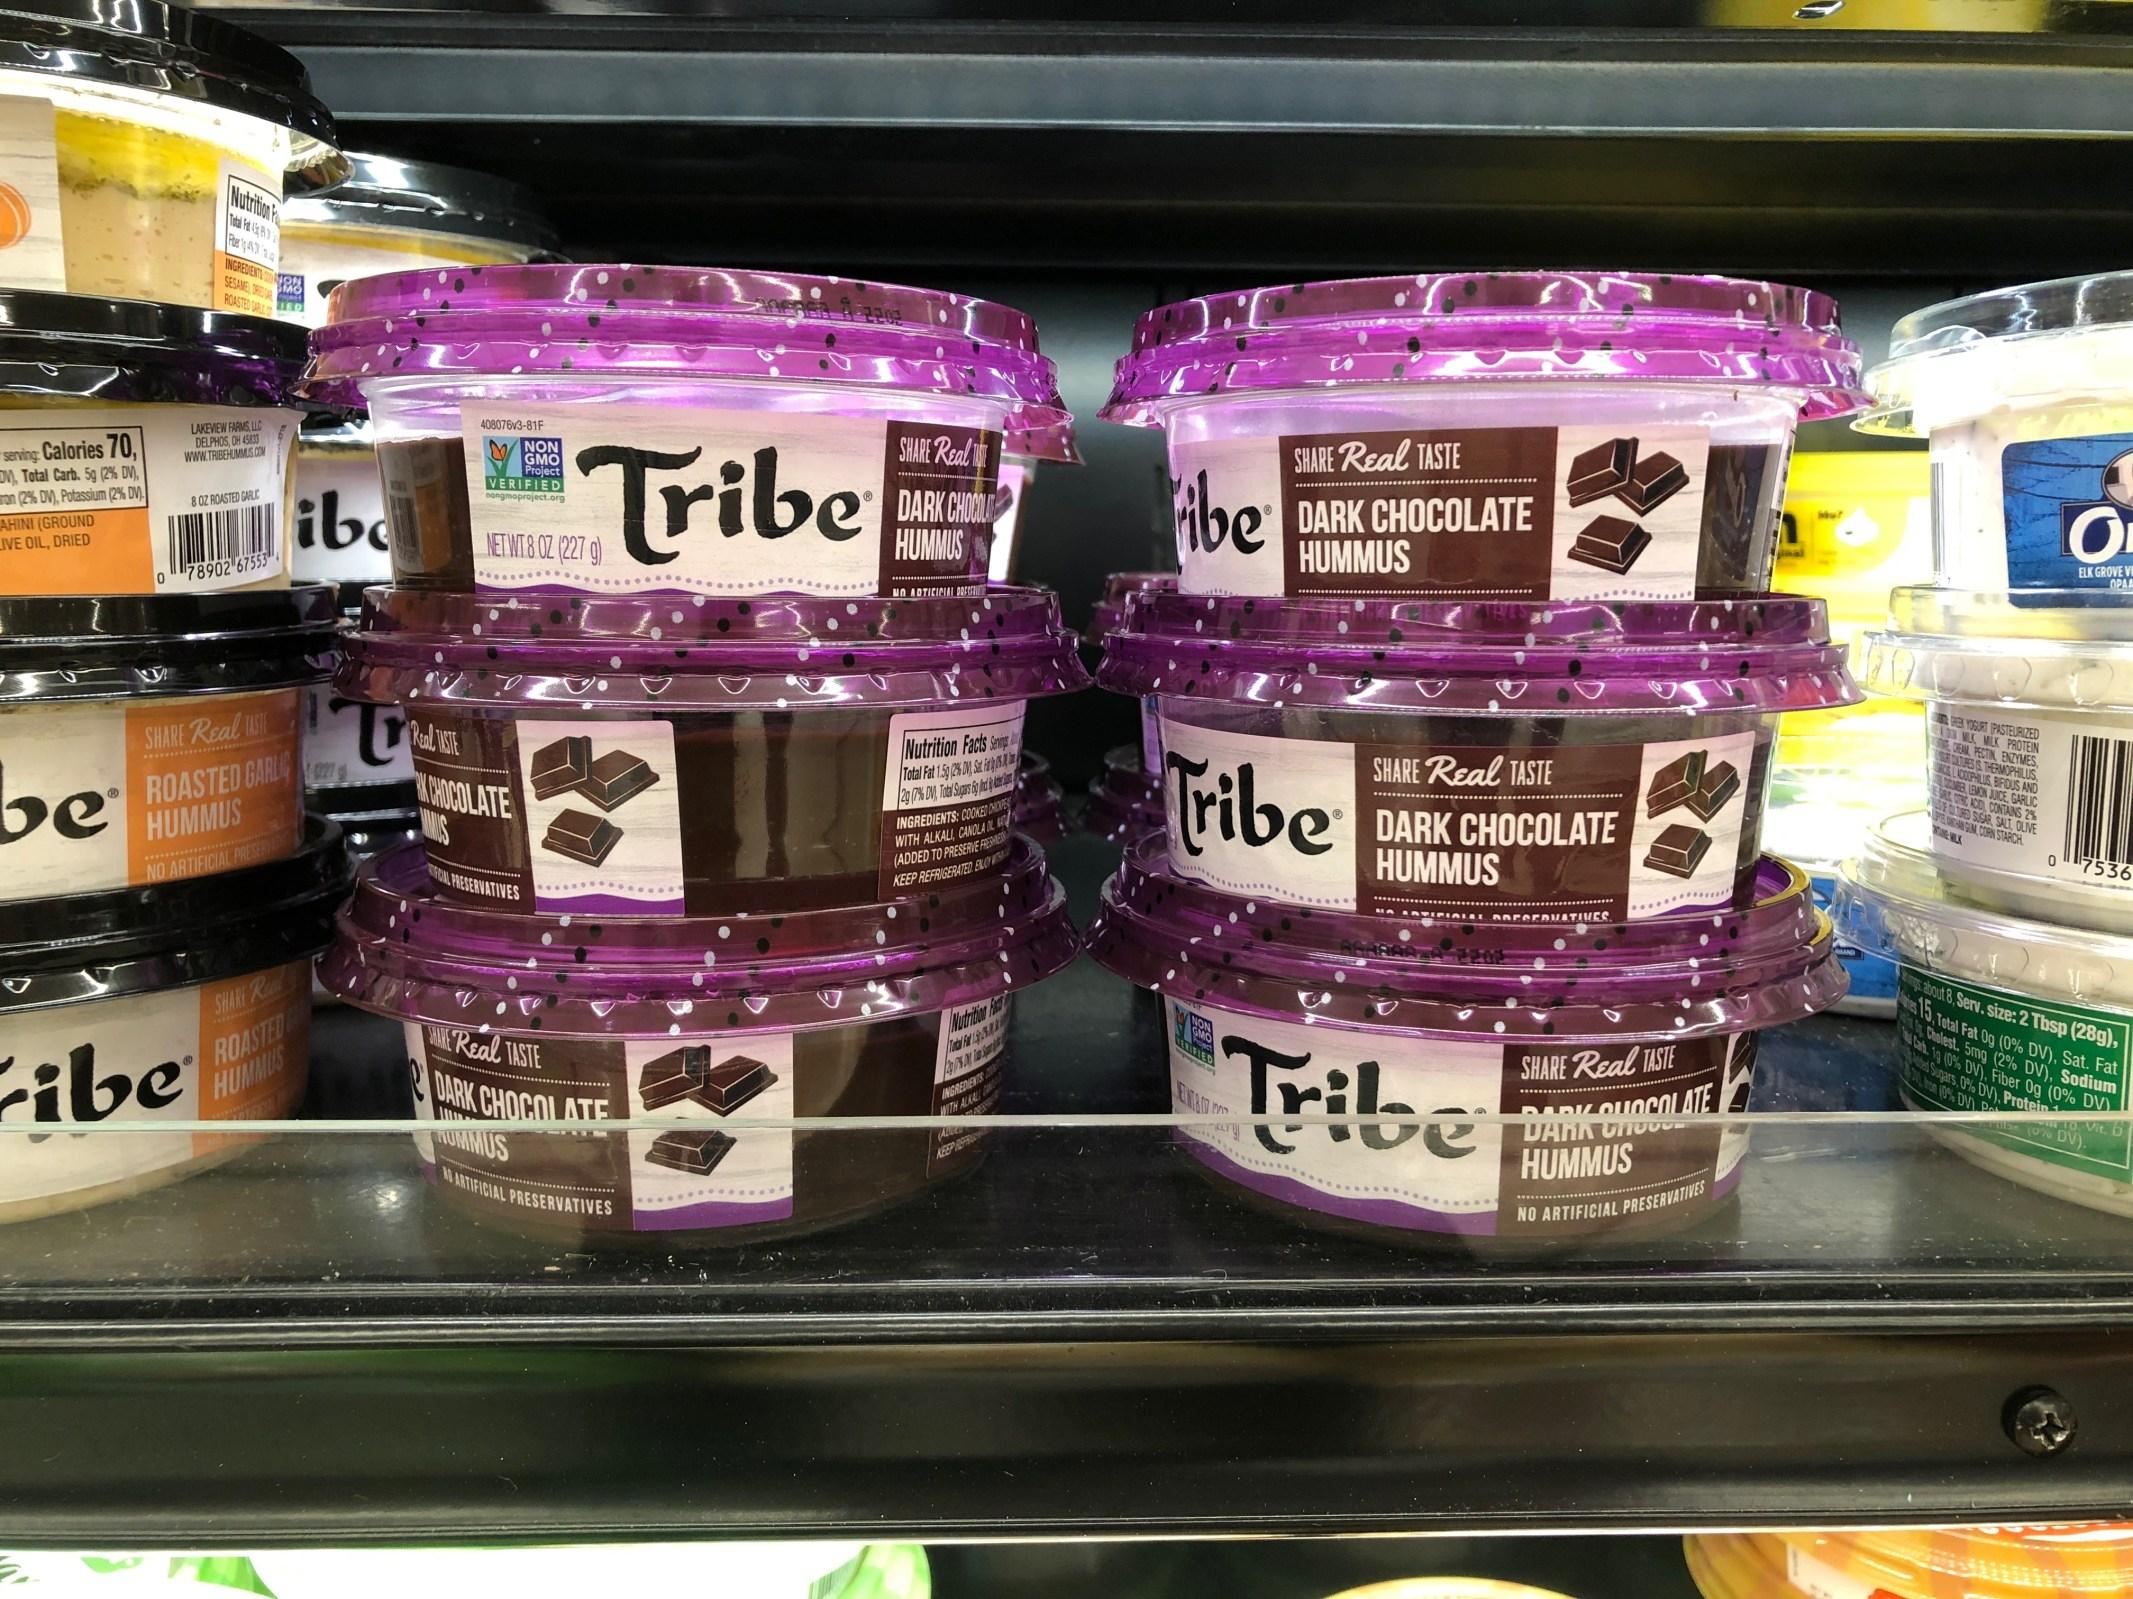 tribe brand dark chocolate hummus at cub supermarket